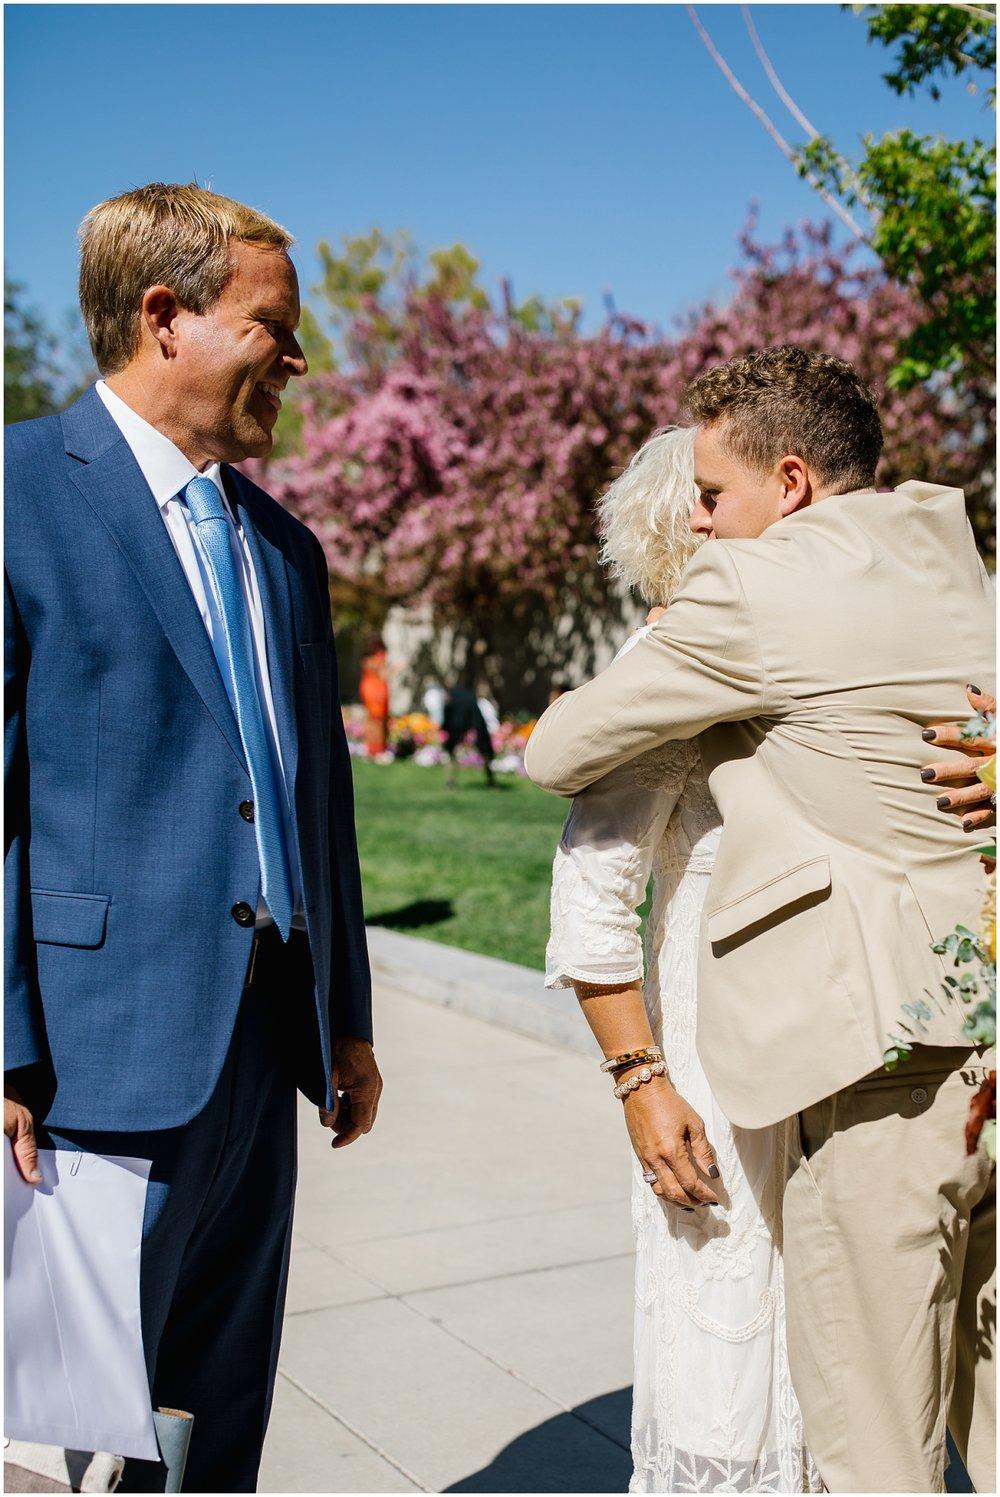 JC-Wedding-46_Lizzie-B-Imagery-Utah-Wedding-Photographer-Park-City-Salt-Lake-City-Temple-Joseph-Smith-Memorial-Building-Empire-Room.jpg